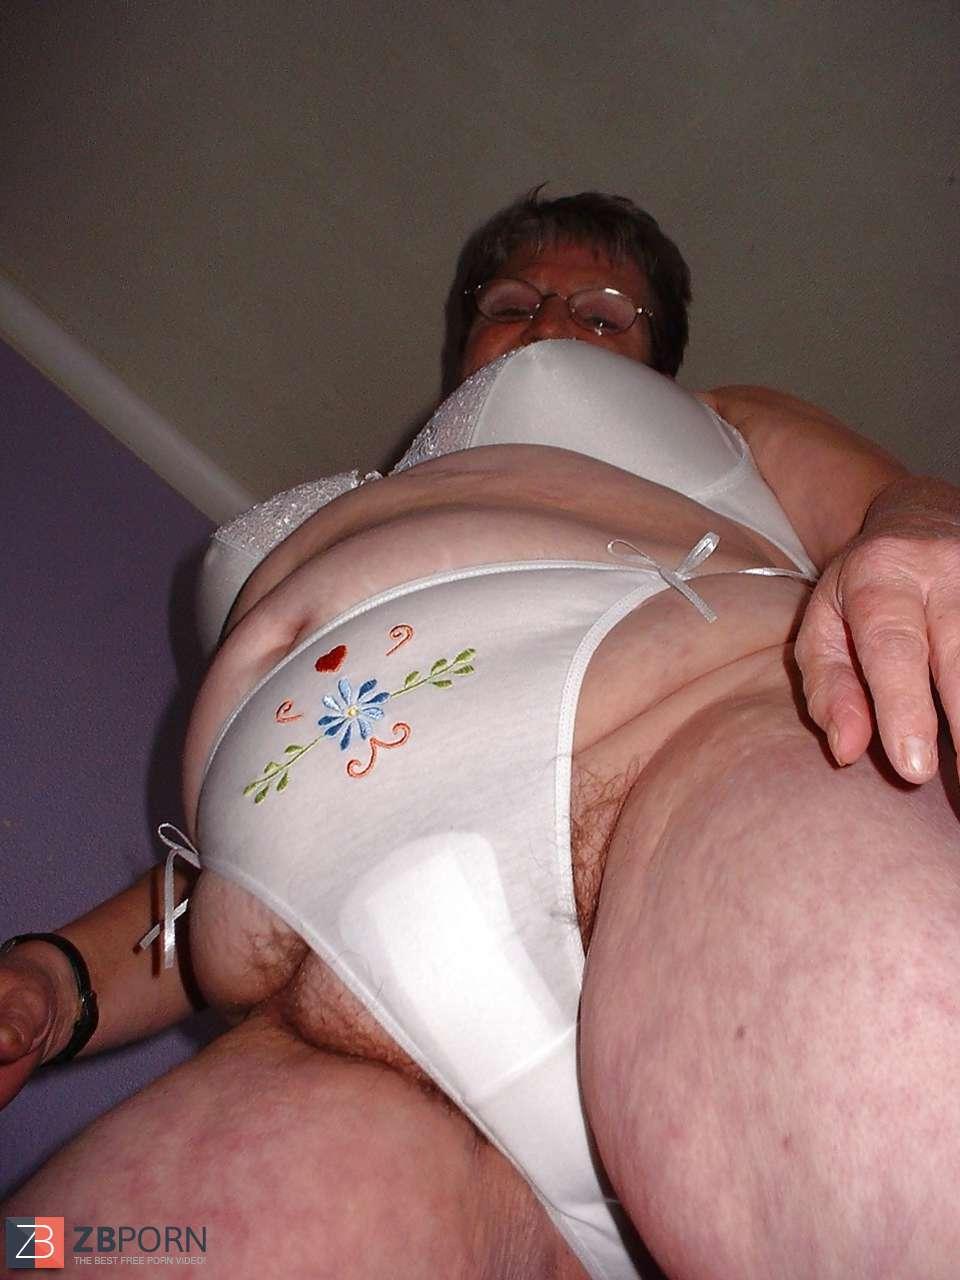 Mature showing panties